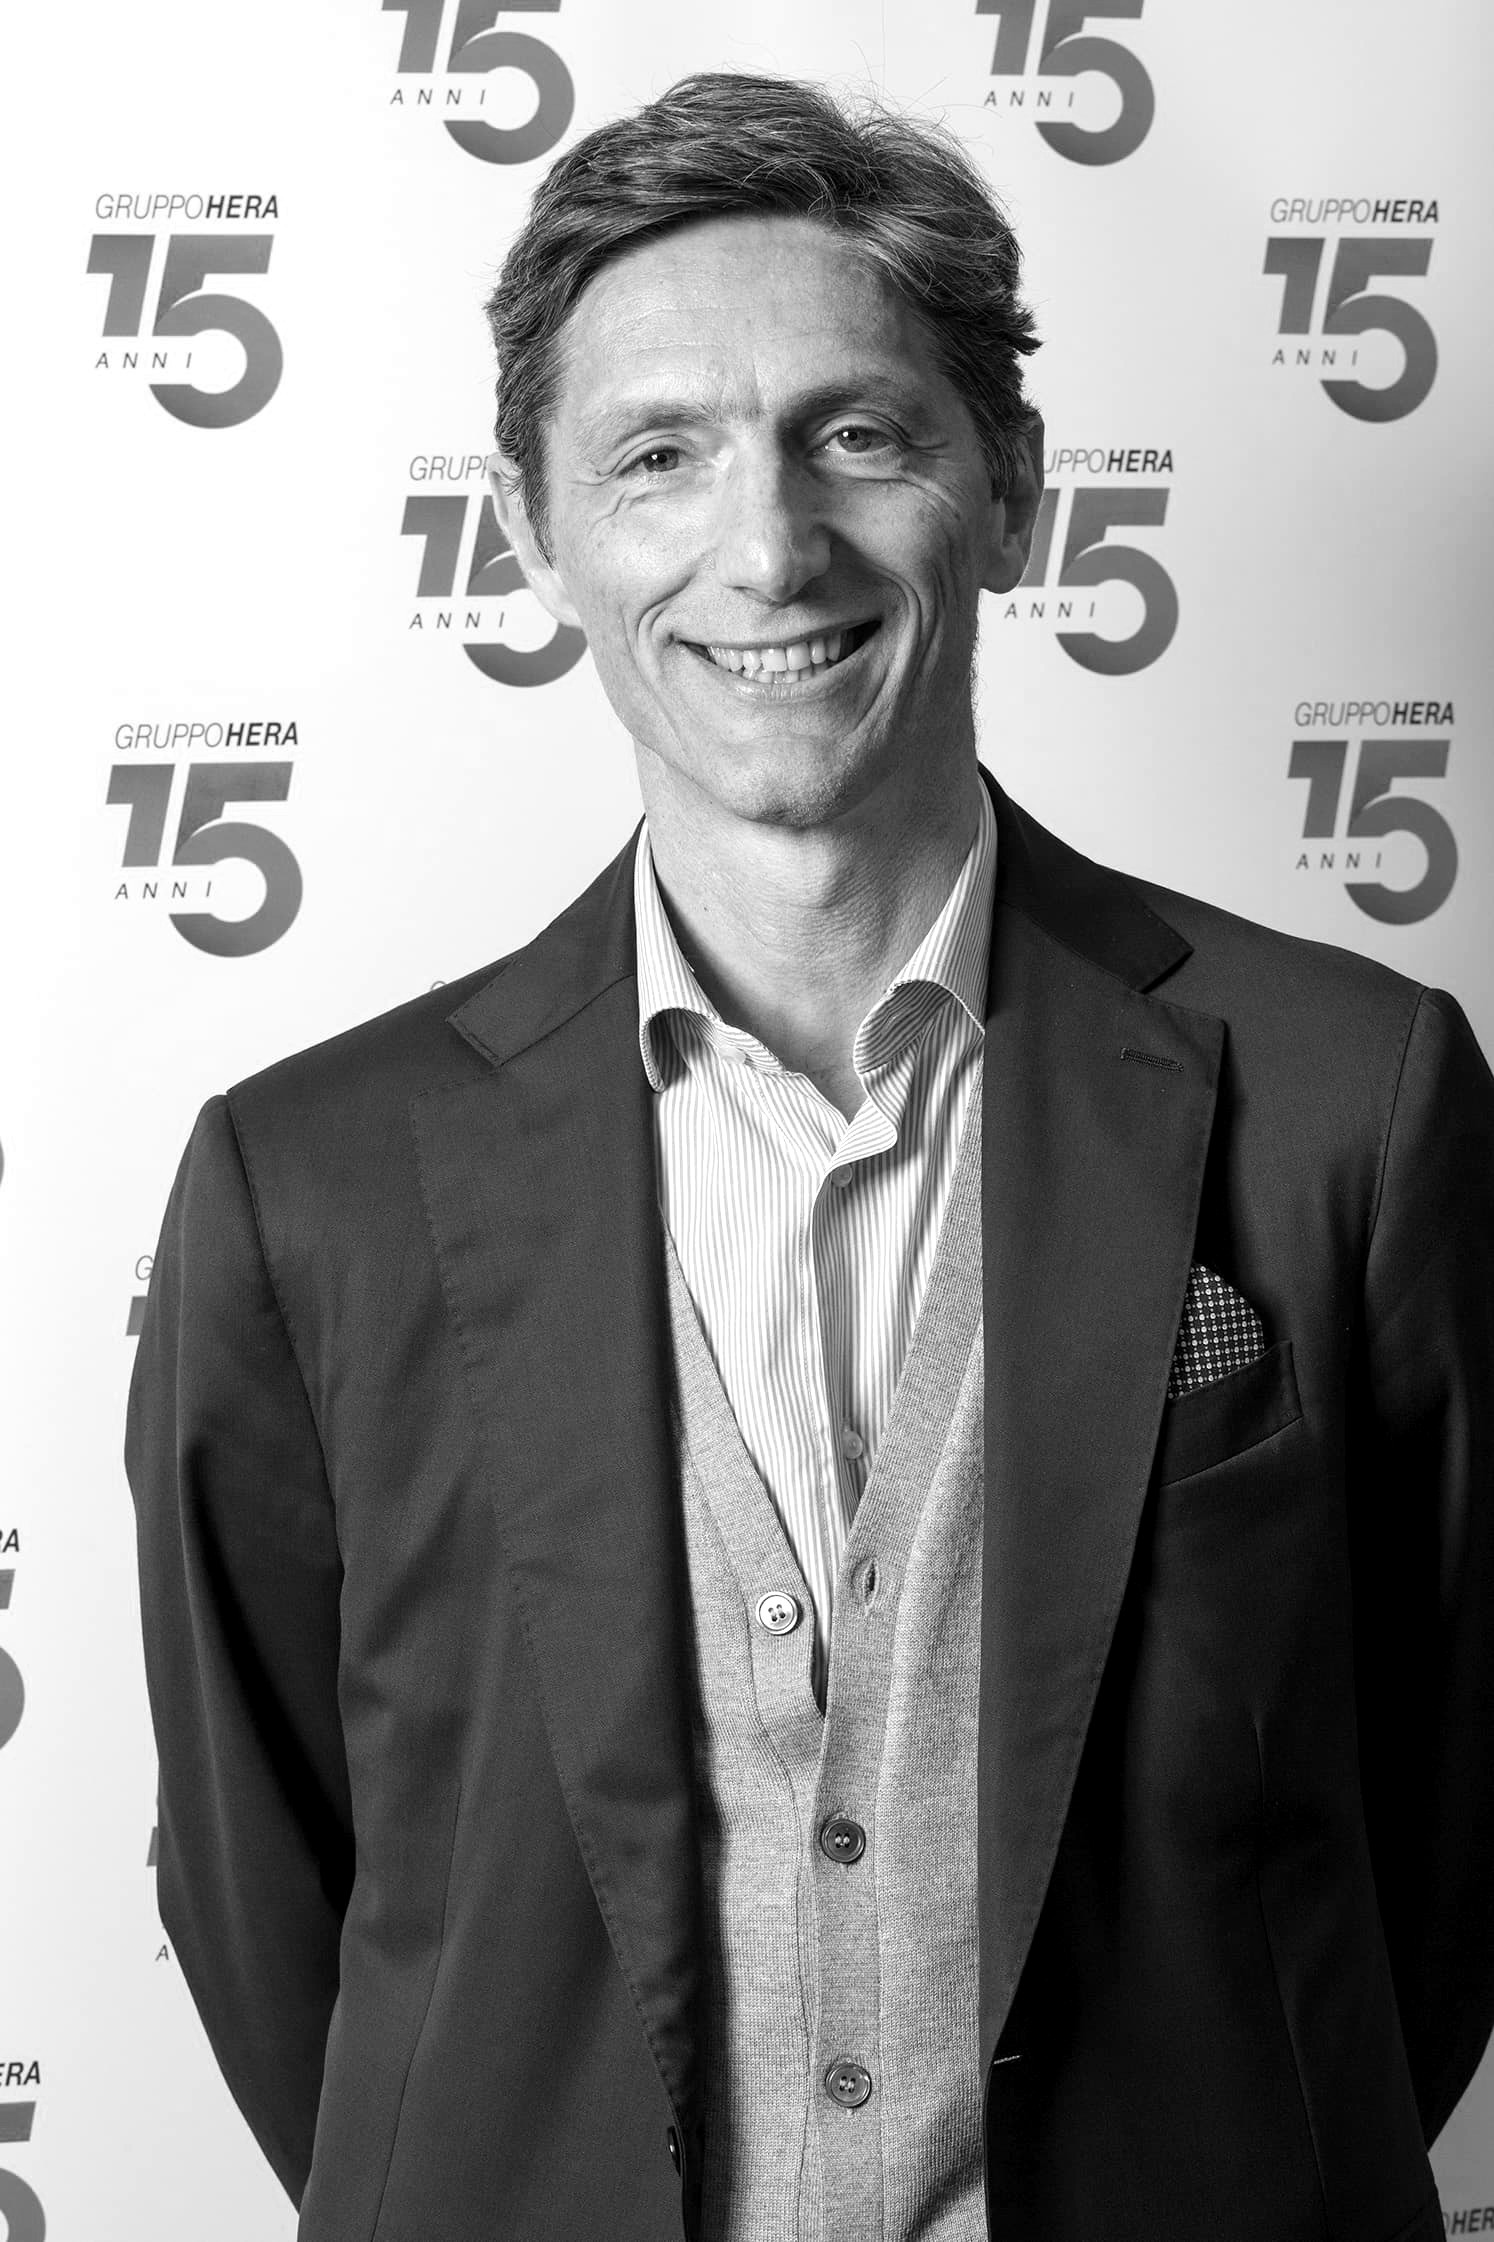 Stefano Venier